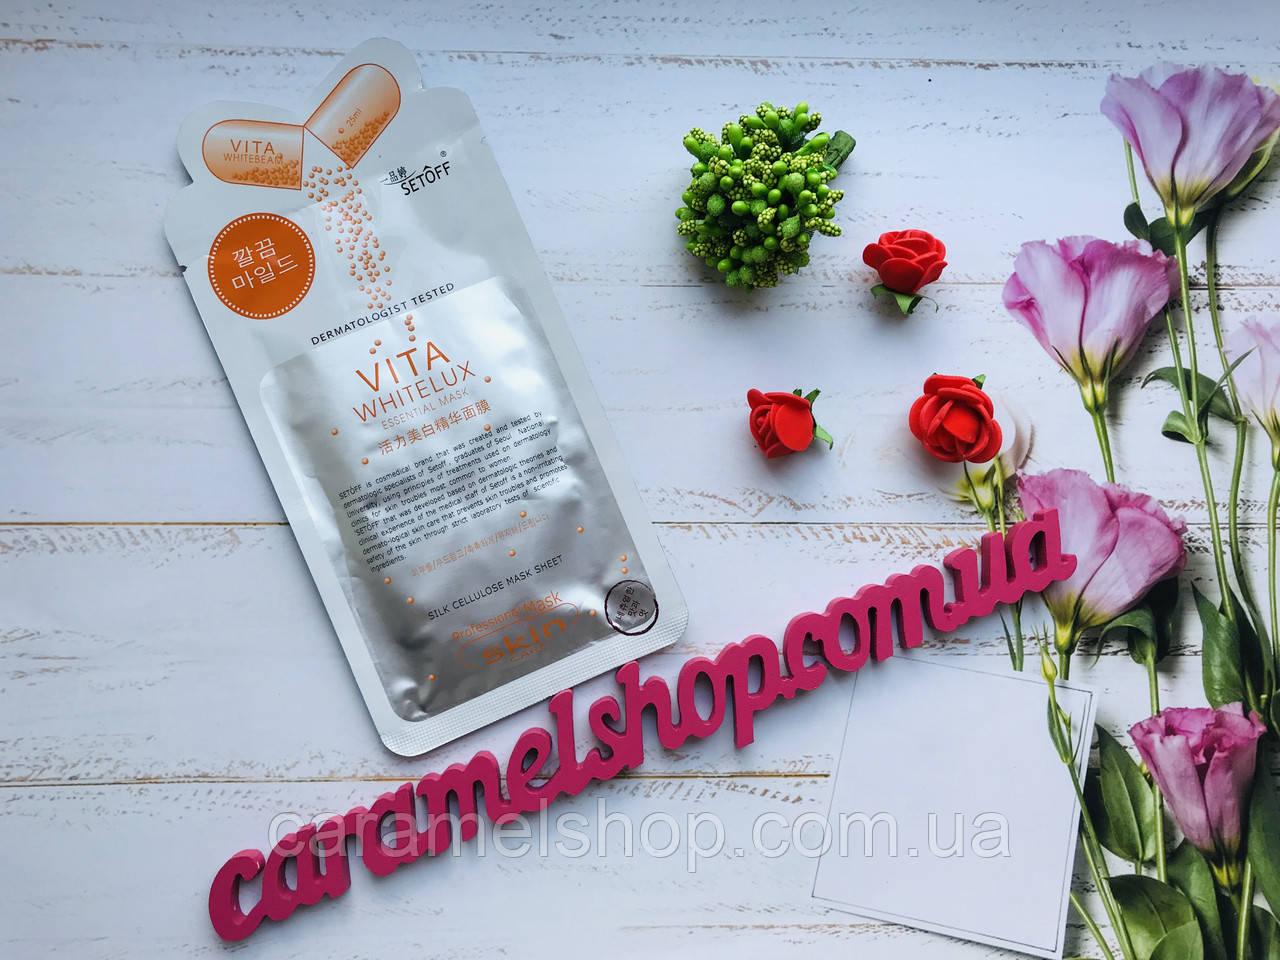 Отбеливающая тканевая маска для лица Vita Whitelux Essential, отбеливающая Skin Care